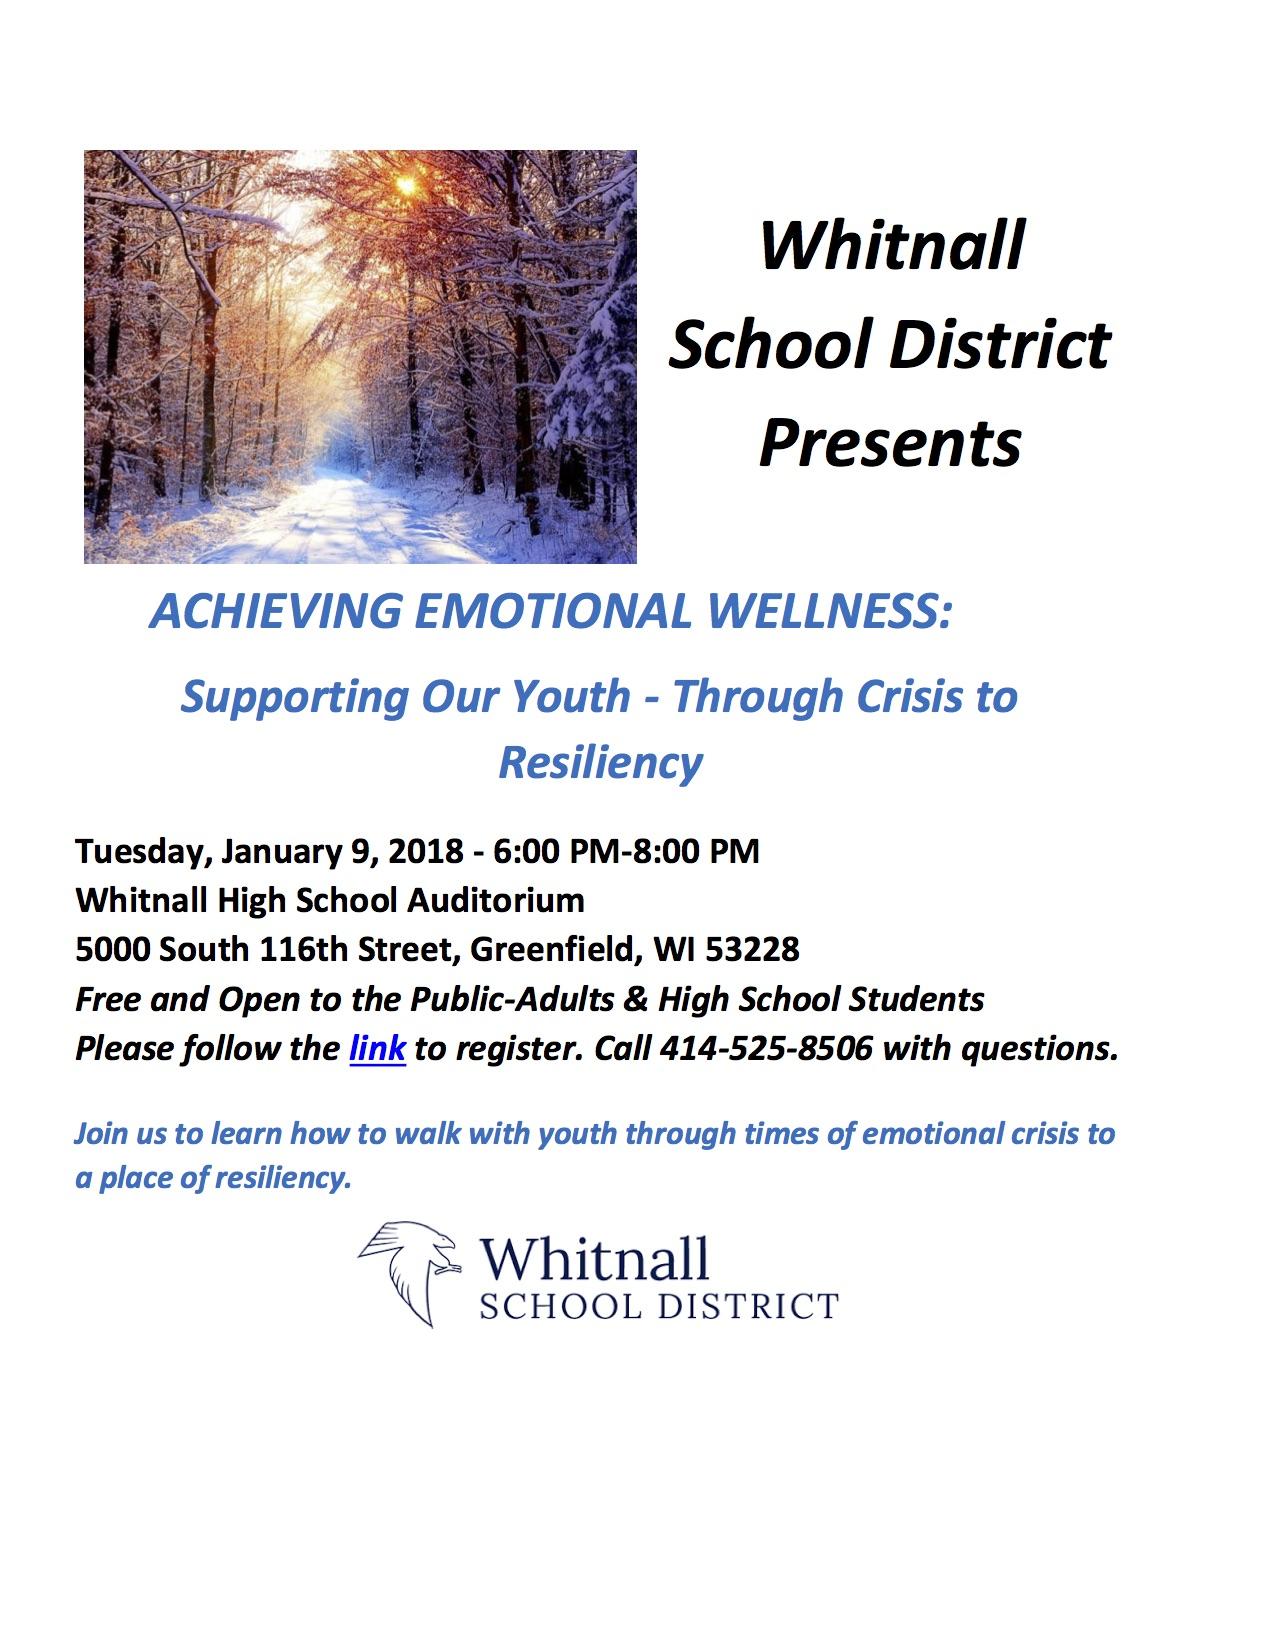 Whitnall Flyer Edited - w%2FLink copy.jpg